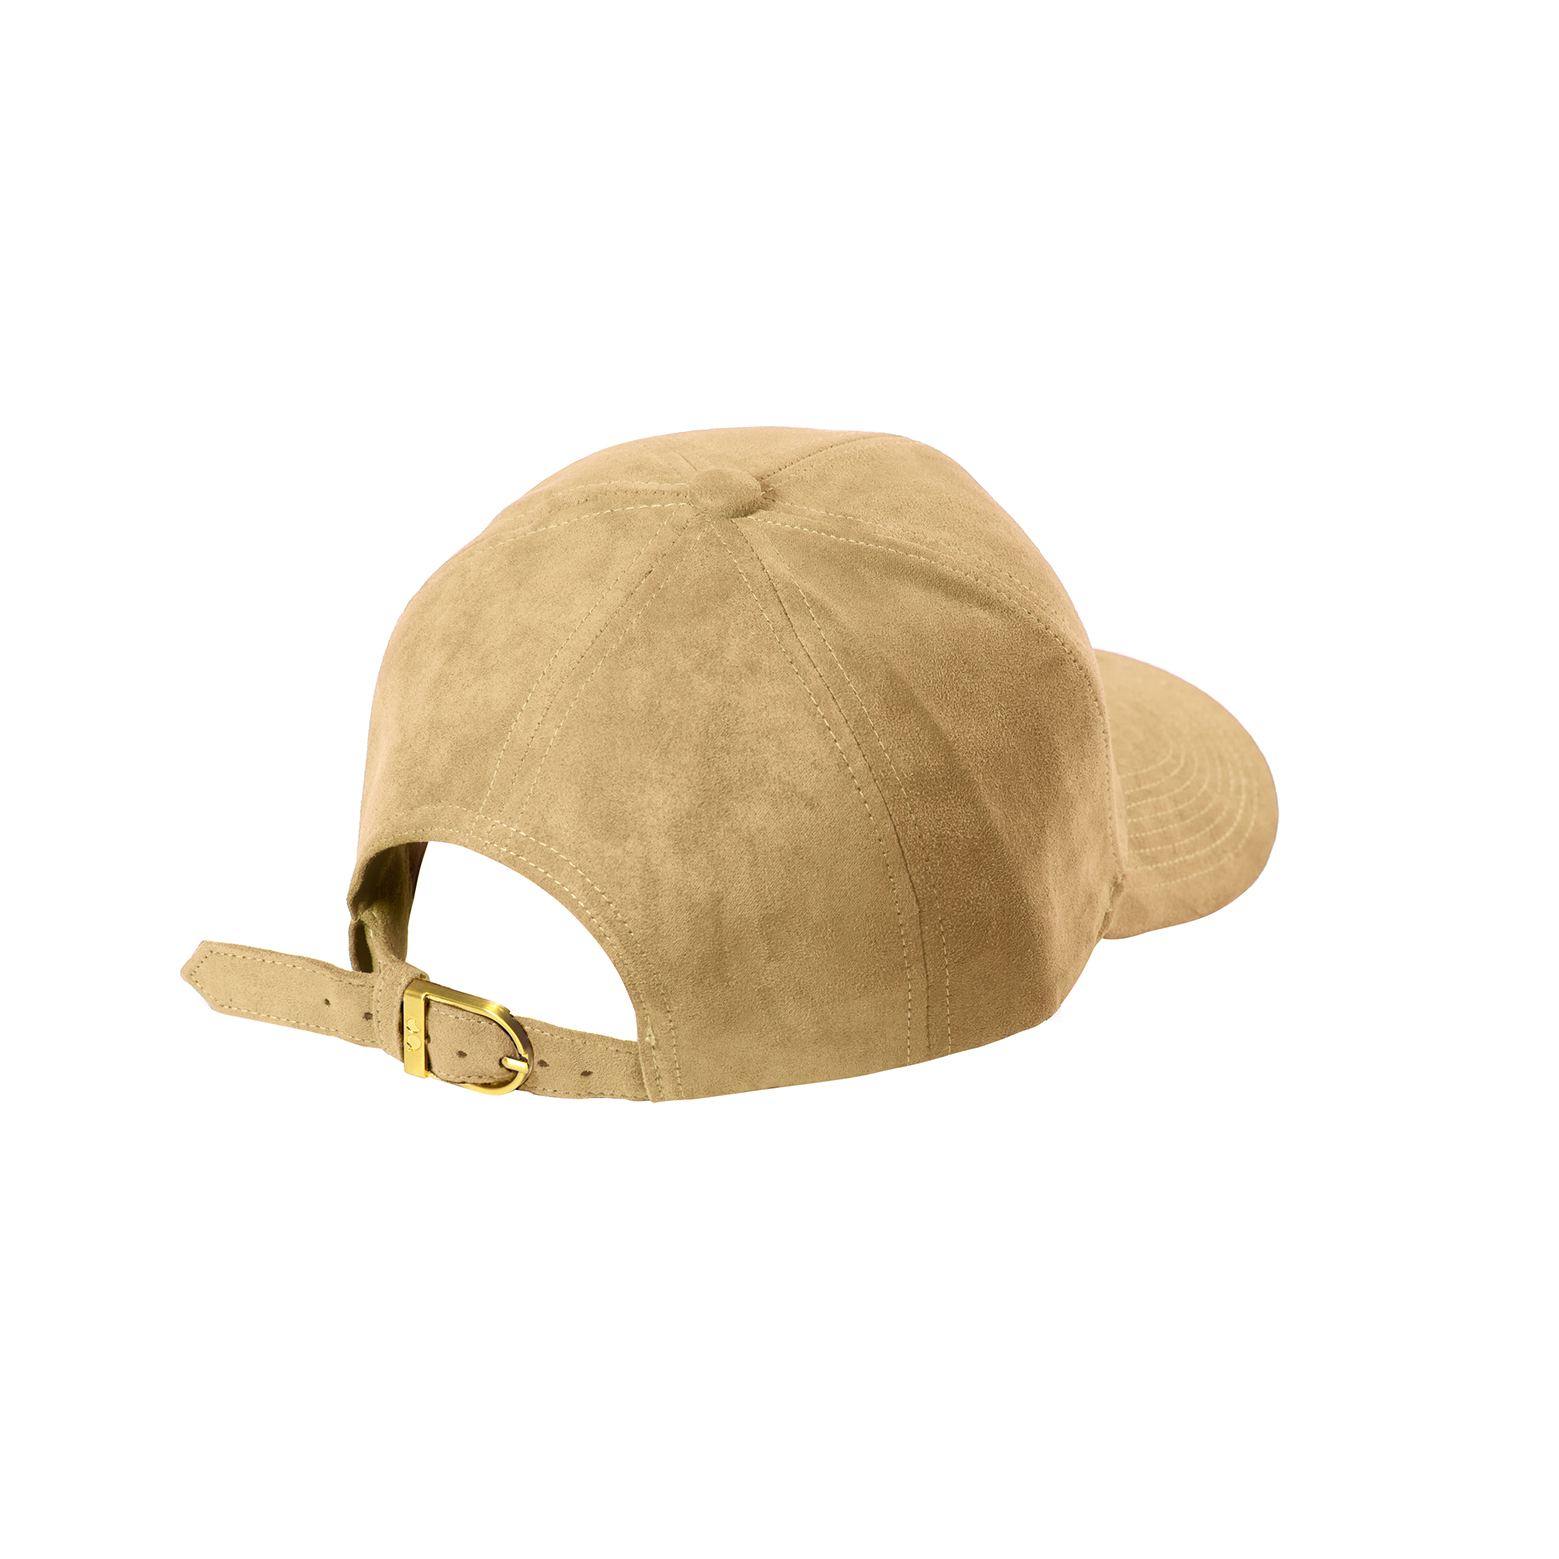 baseball-cap-beige-suede-back-side